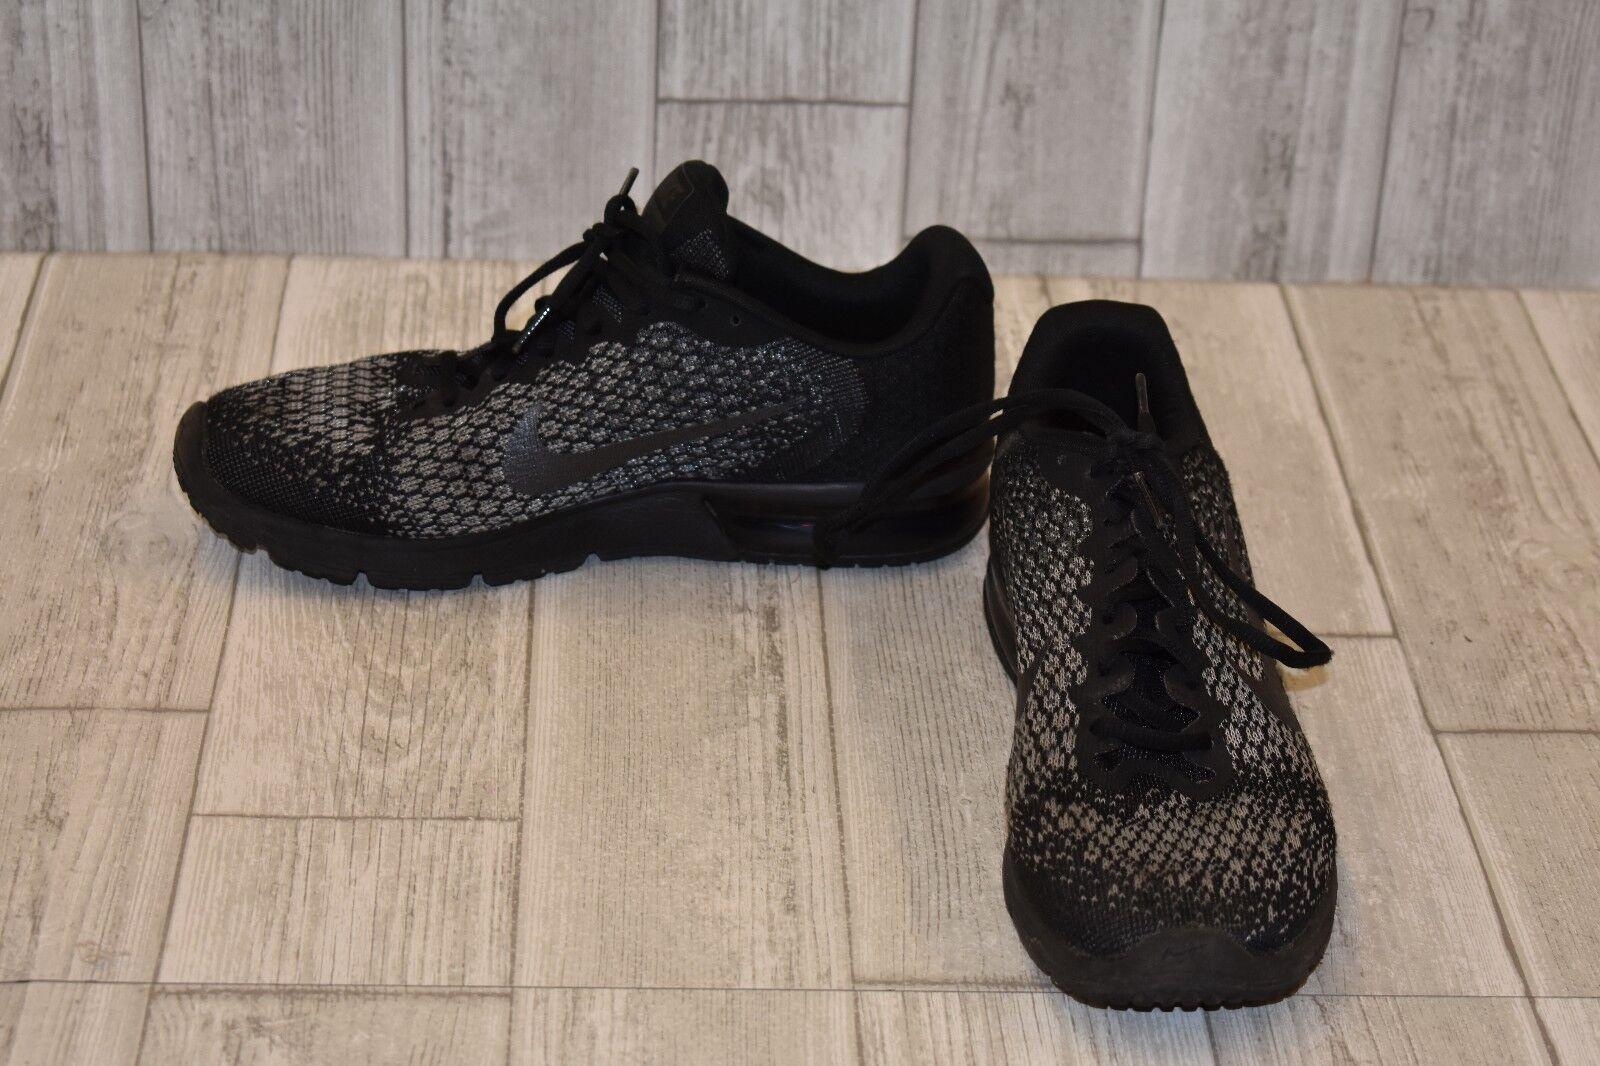 Nike Air Max Sequent 2 Athletic Scarpe da Ginnastica, Uomo Size 10, Nero/Grey